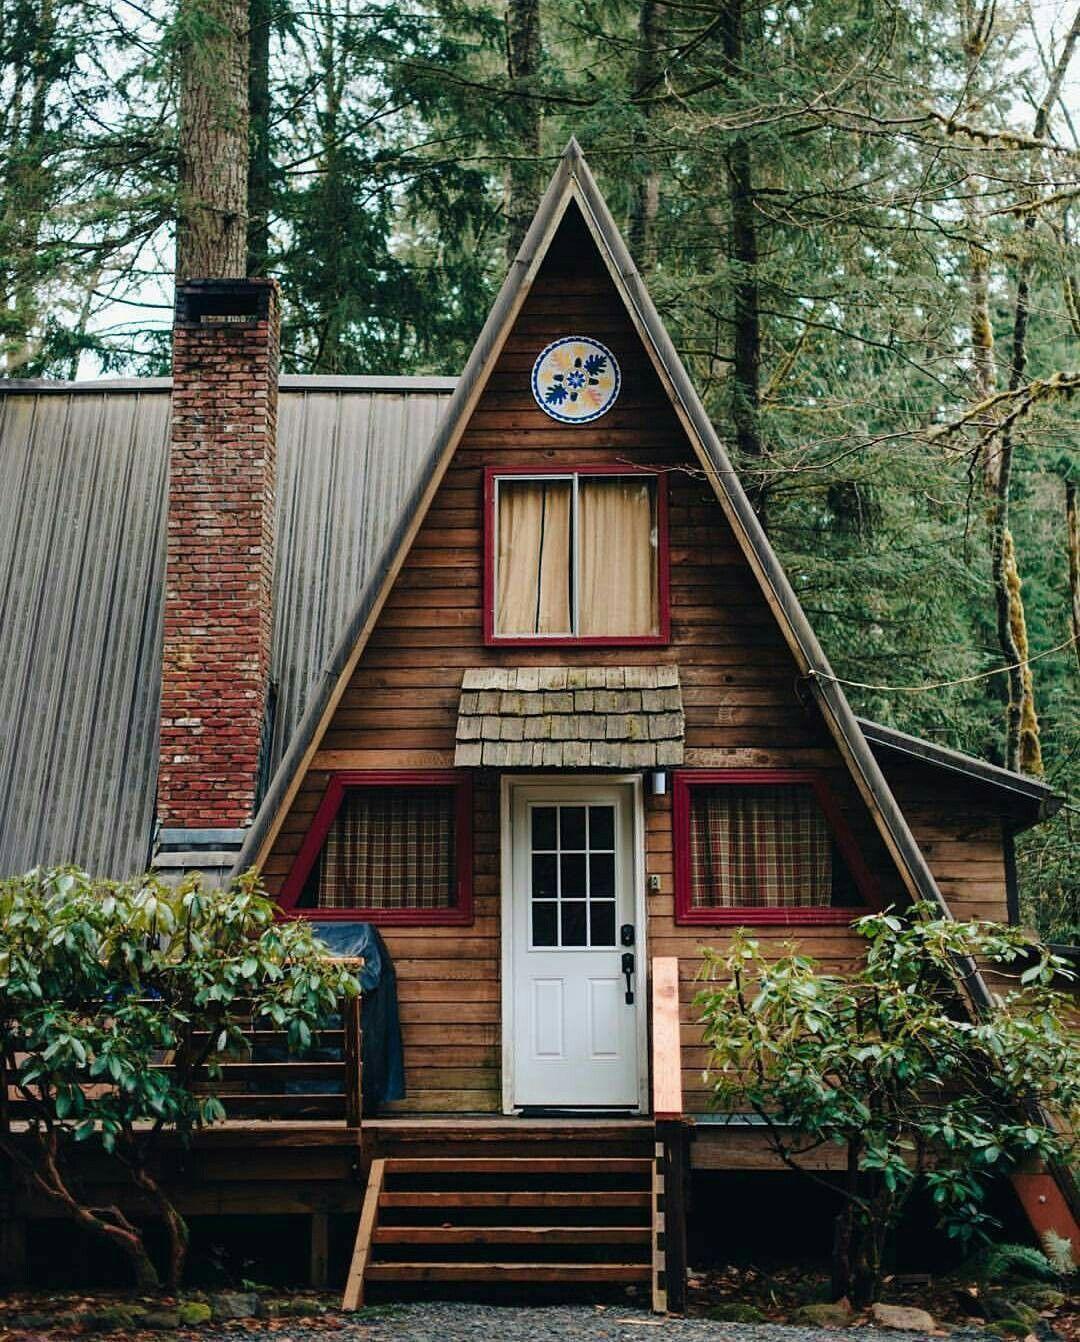 Gingerbread housegingerbread house in 2020 cabin in